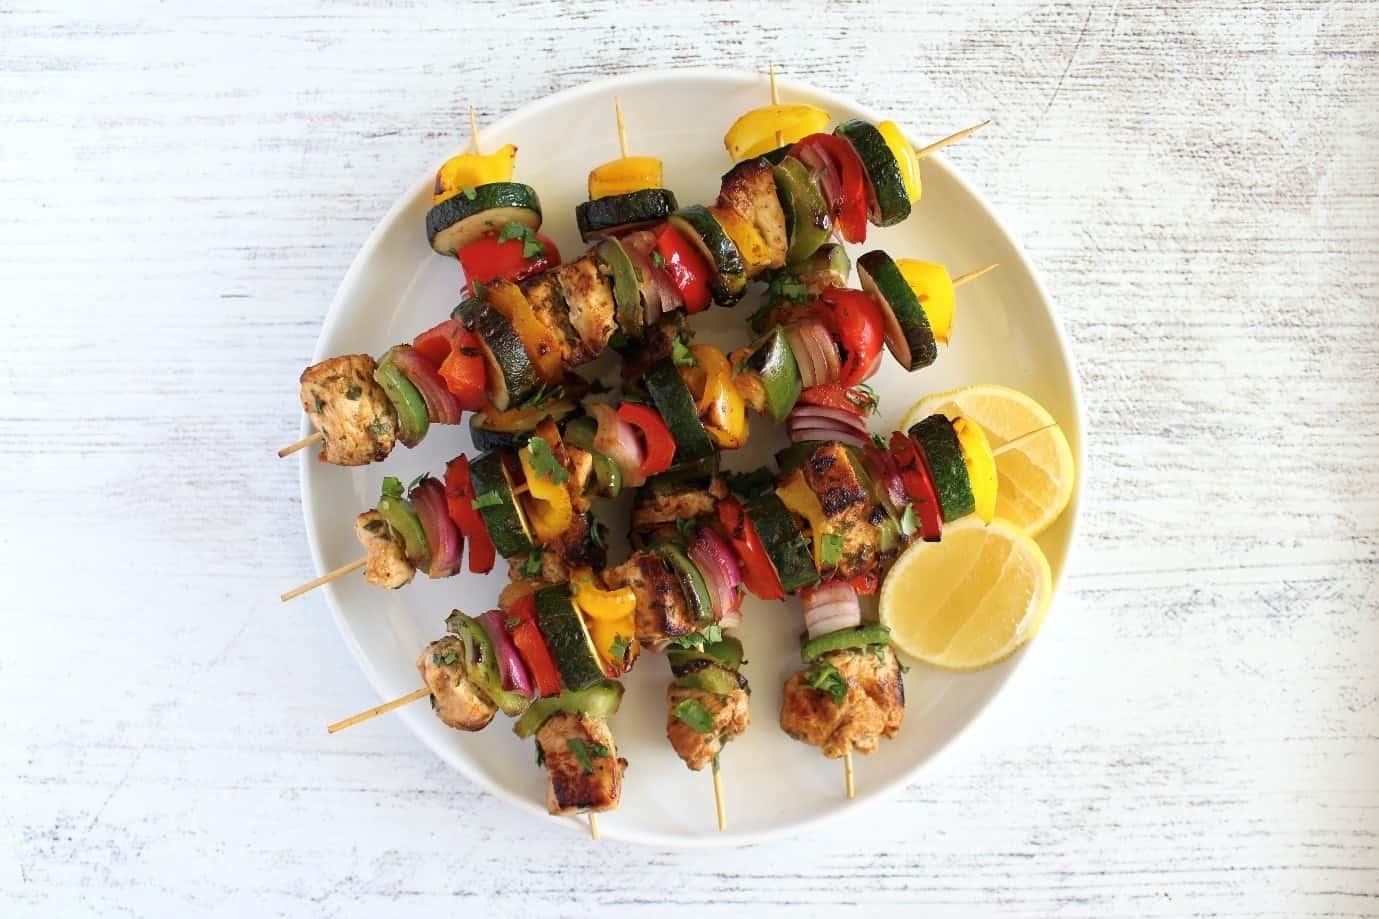 Spanish Chicken and Vegetable Skewers